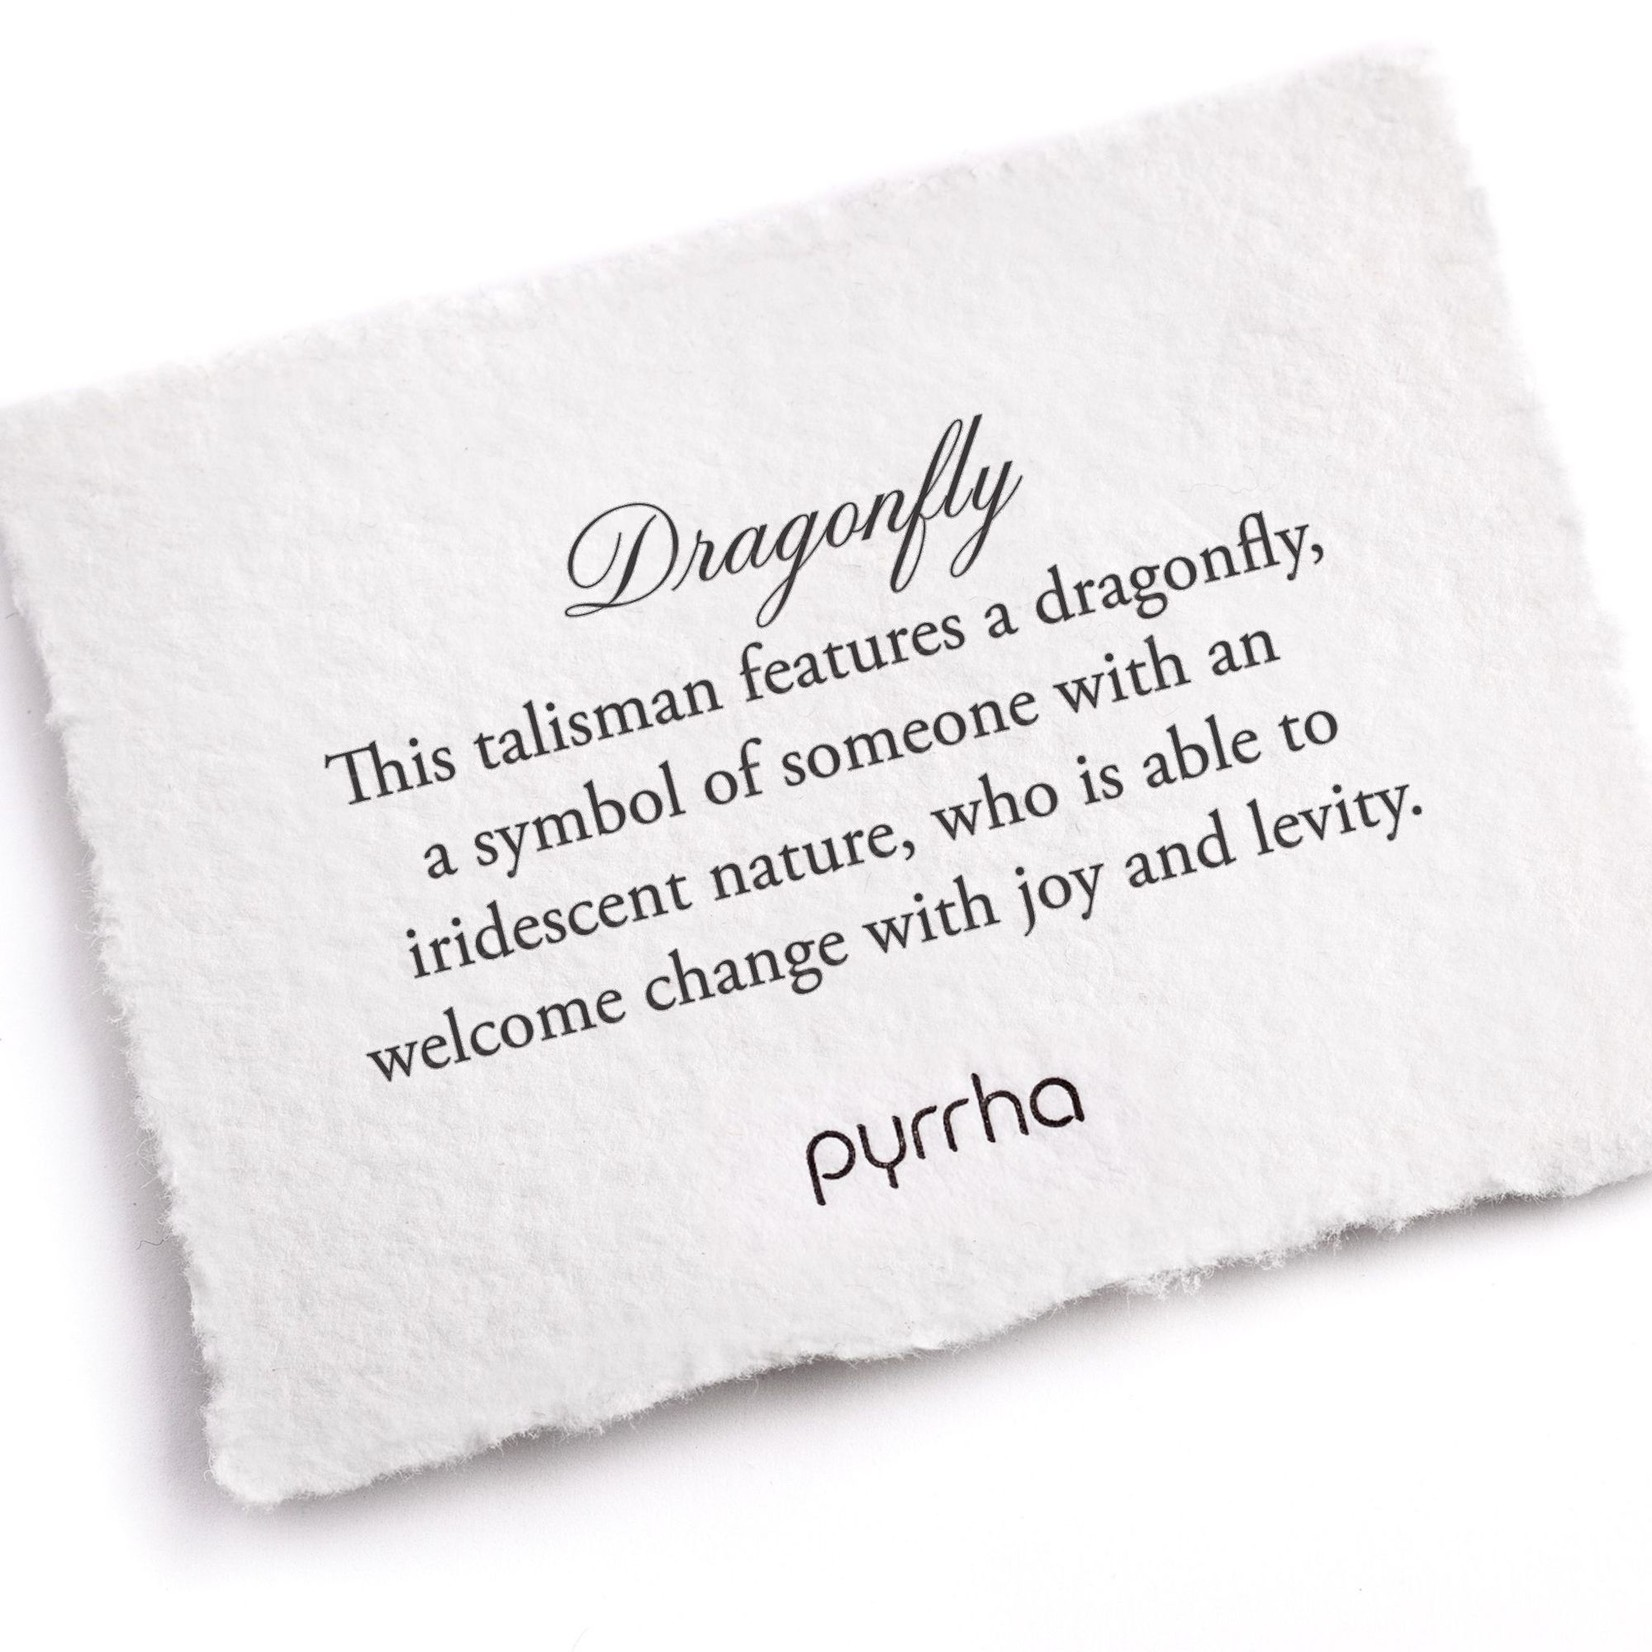 Pyrrha Dragonfly Signature Talisman